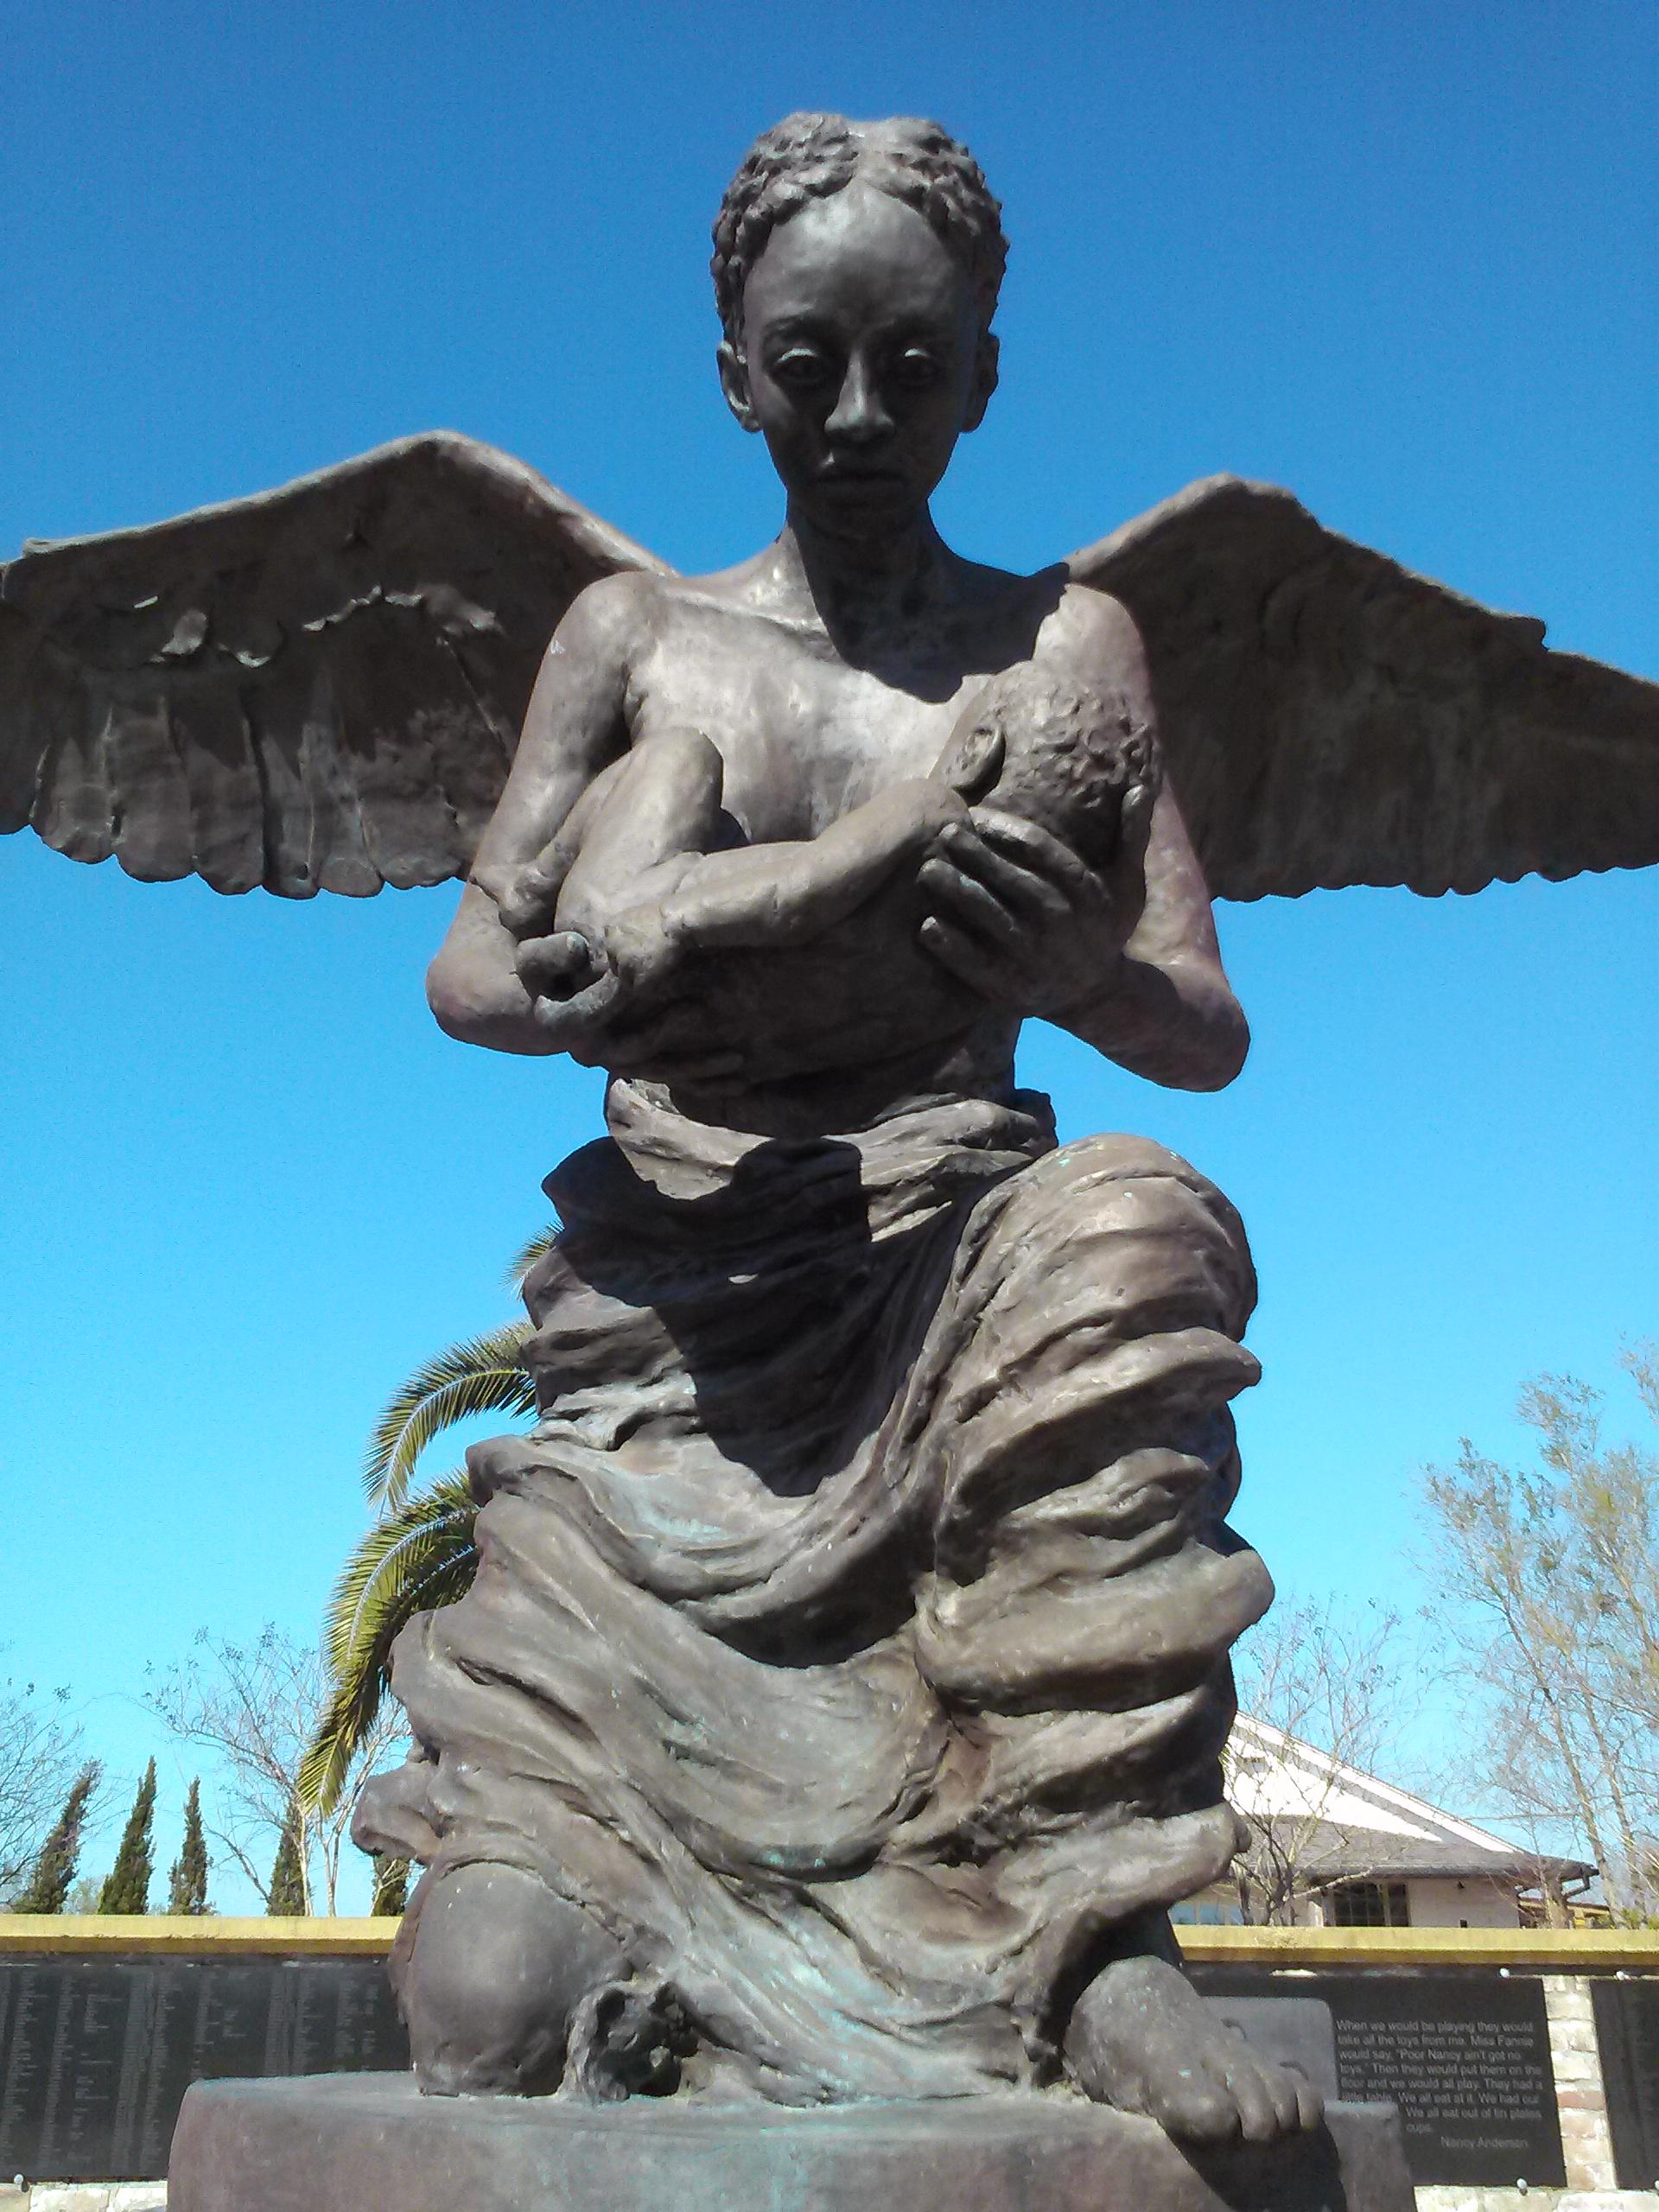 Field of Angels, Whitney Plantation, February 28, 2015 / Credit: Jessica Marie Johnson